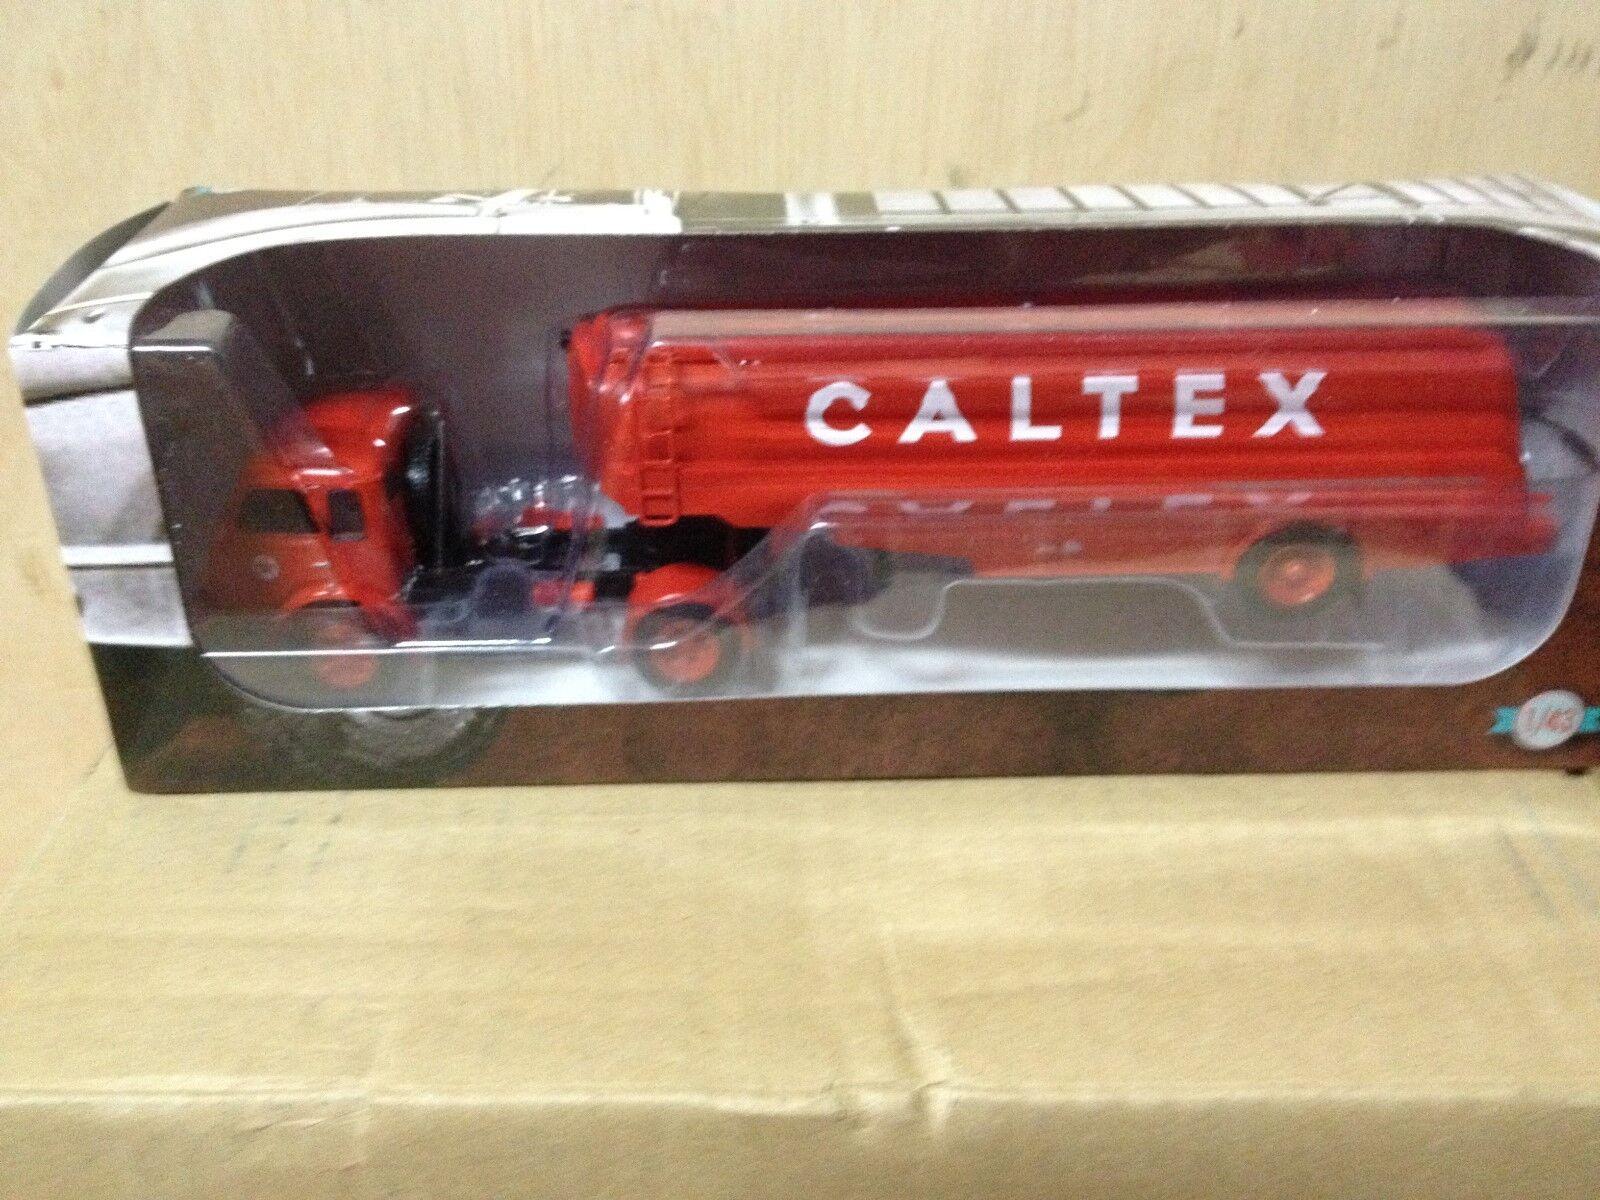 LKW SAVIEM TANCARVILLE CALTEX - IXO ALTAYA 1 43 LASTWAGEN TRAILER (EB79)  | Verrückter Preis, Birmingham